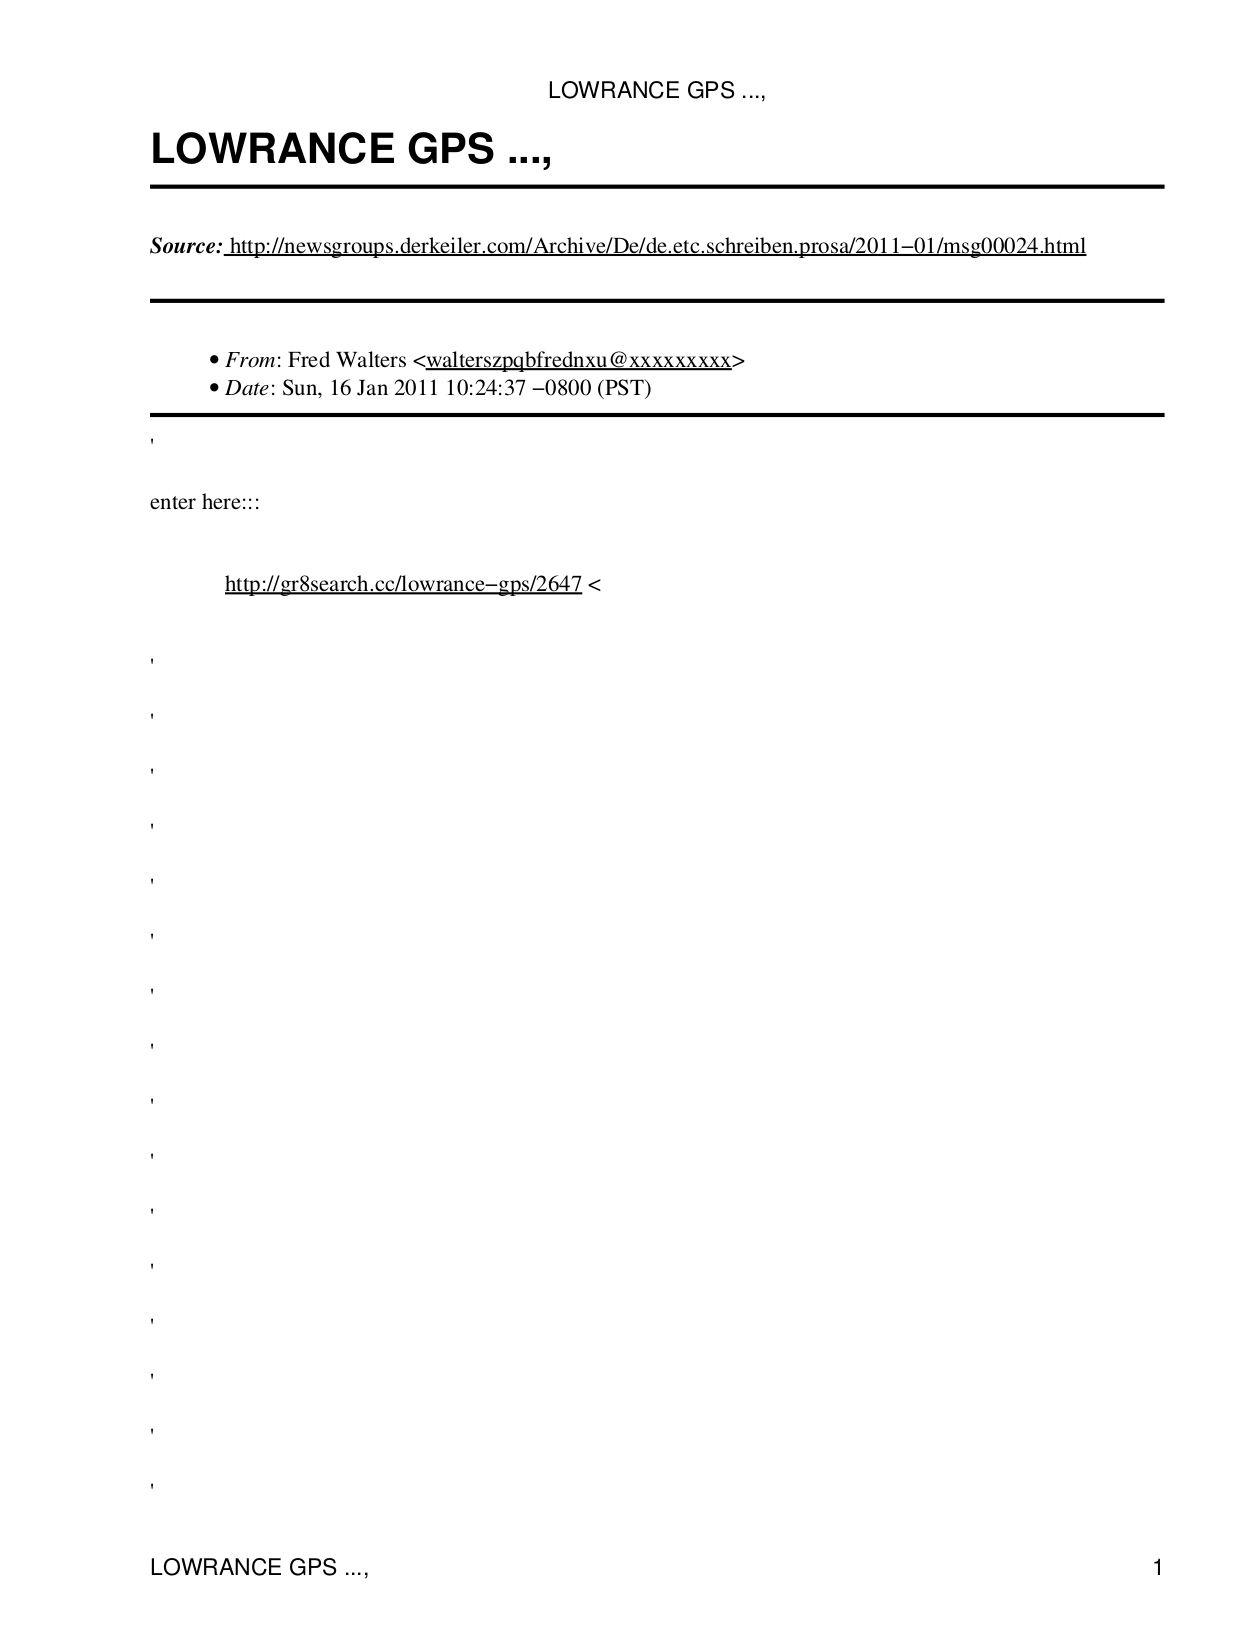 pdf for Lowrance GPS iWAY 100M manual